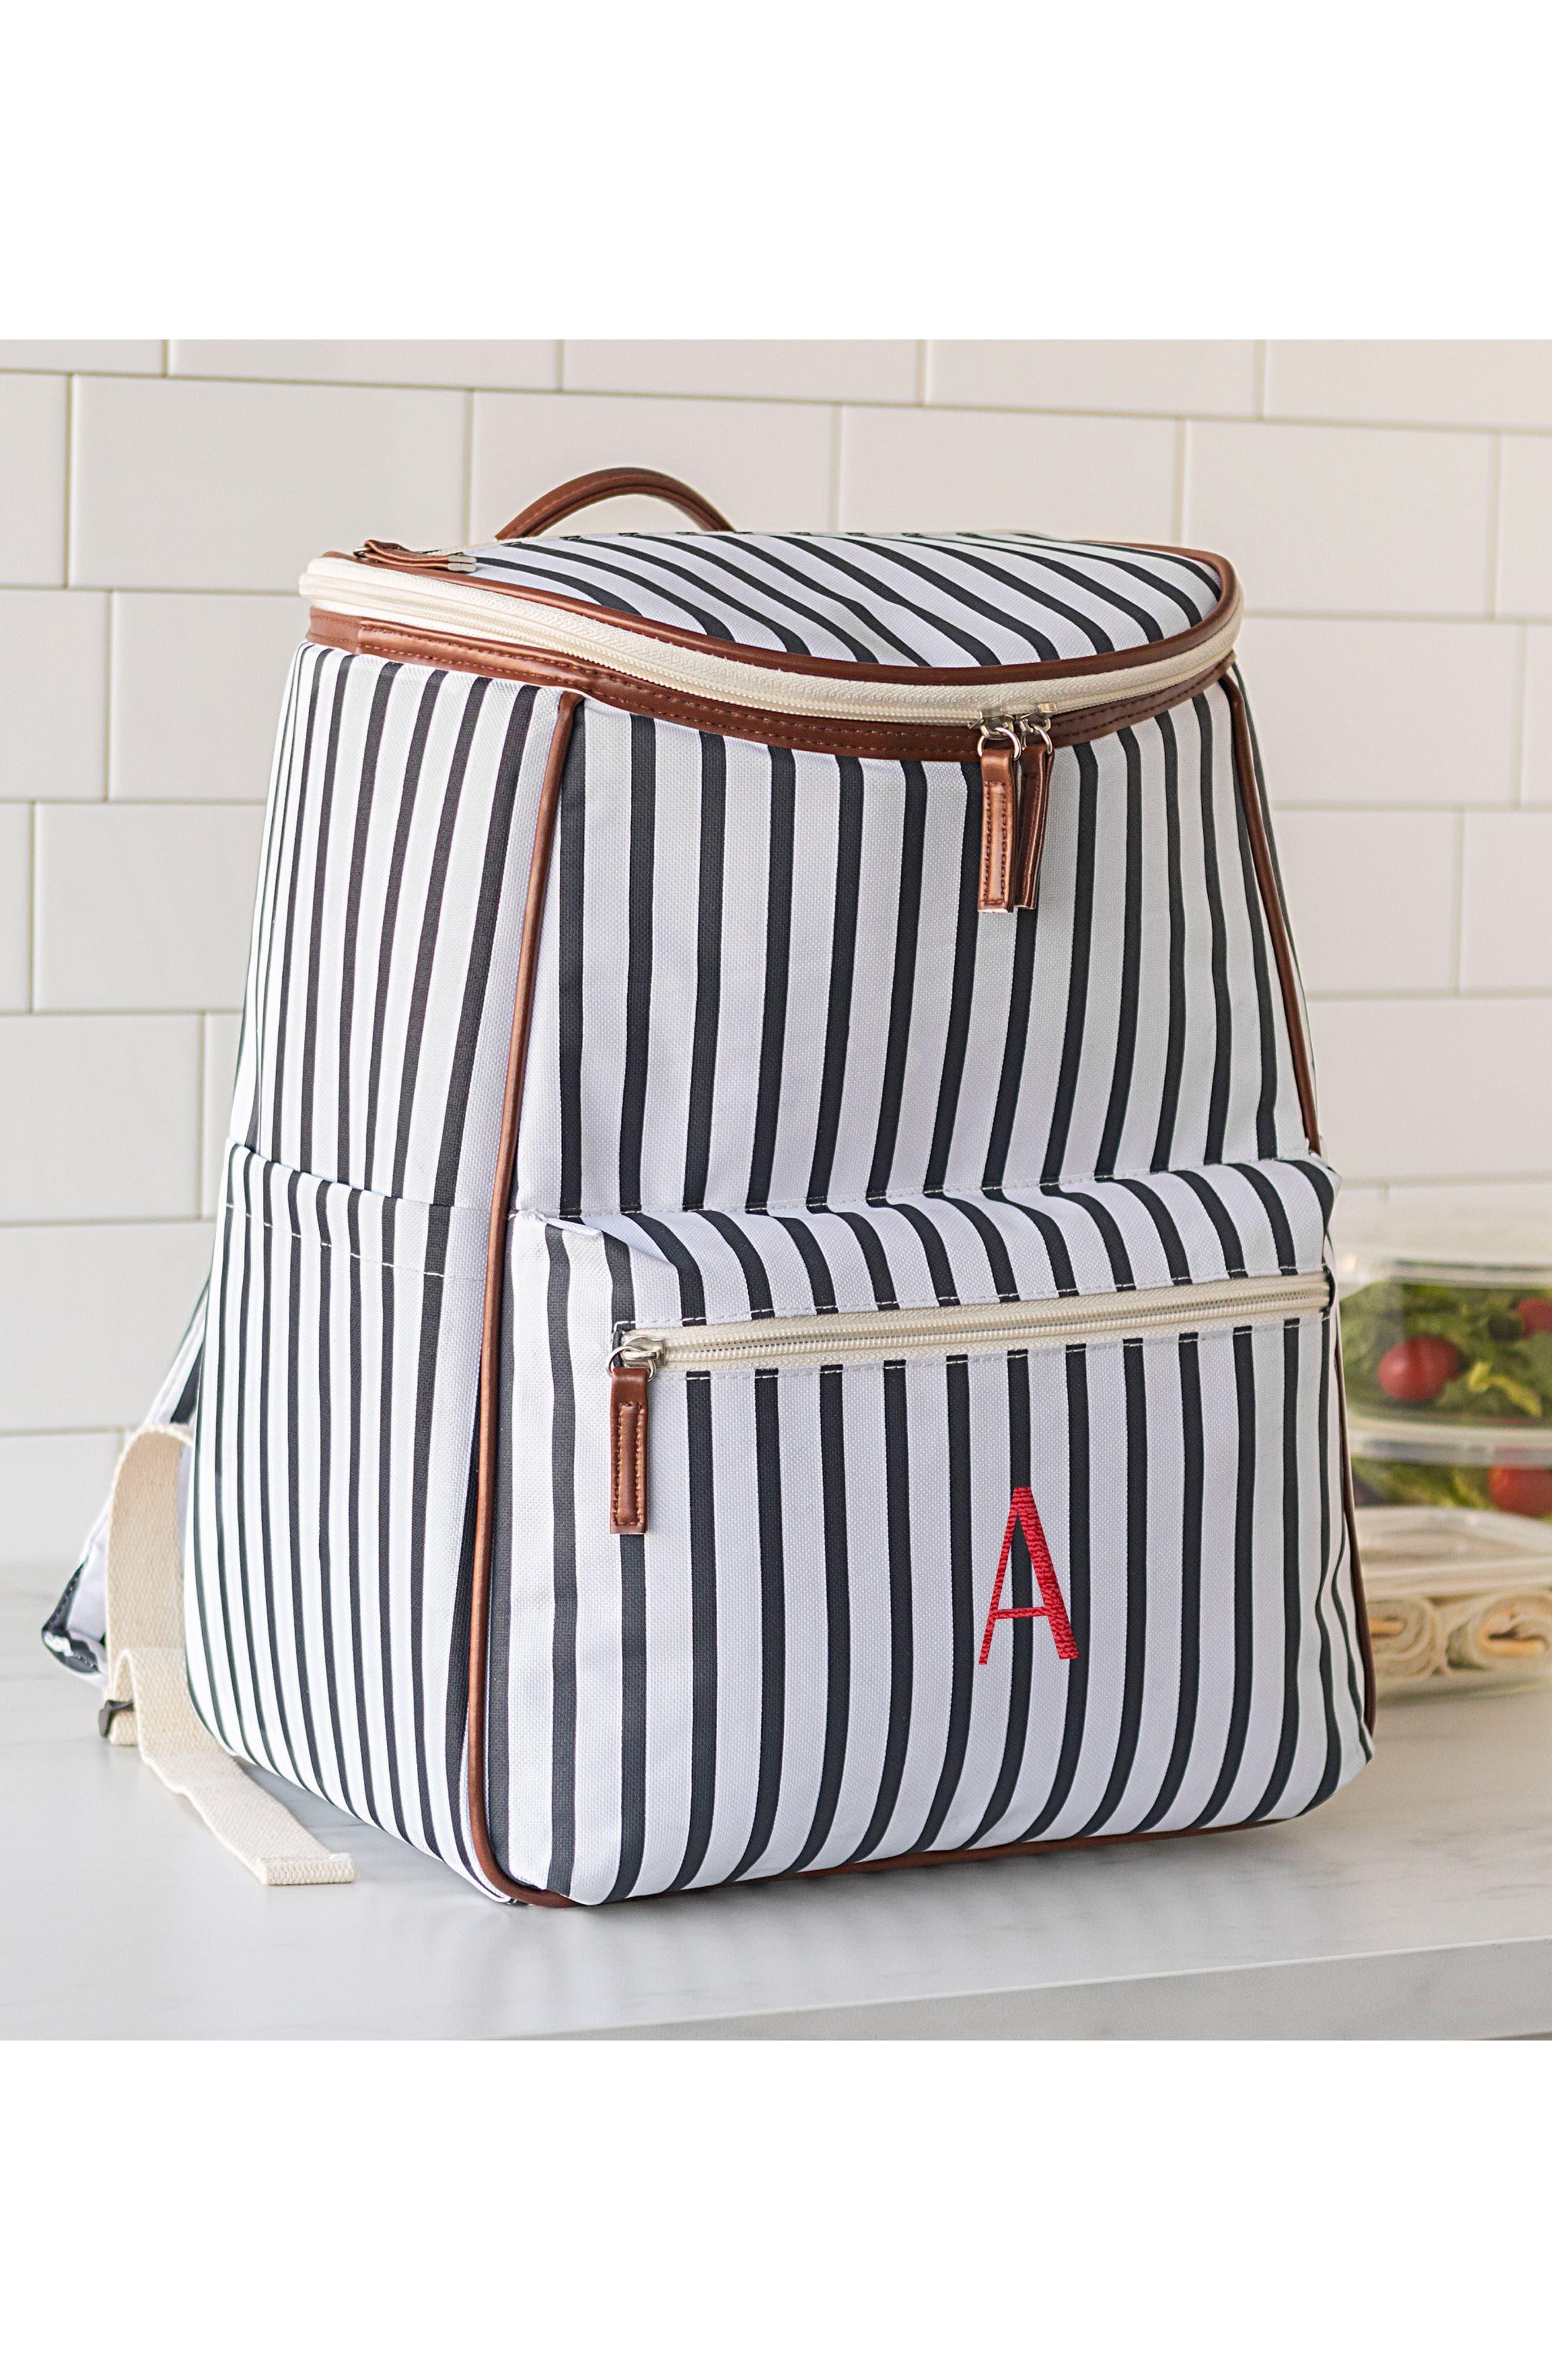 Monogram Stripe Backpack Cooler,                             Alternate thumbnail 9, color,                             BLUE